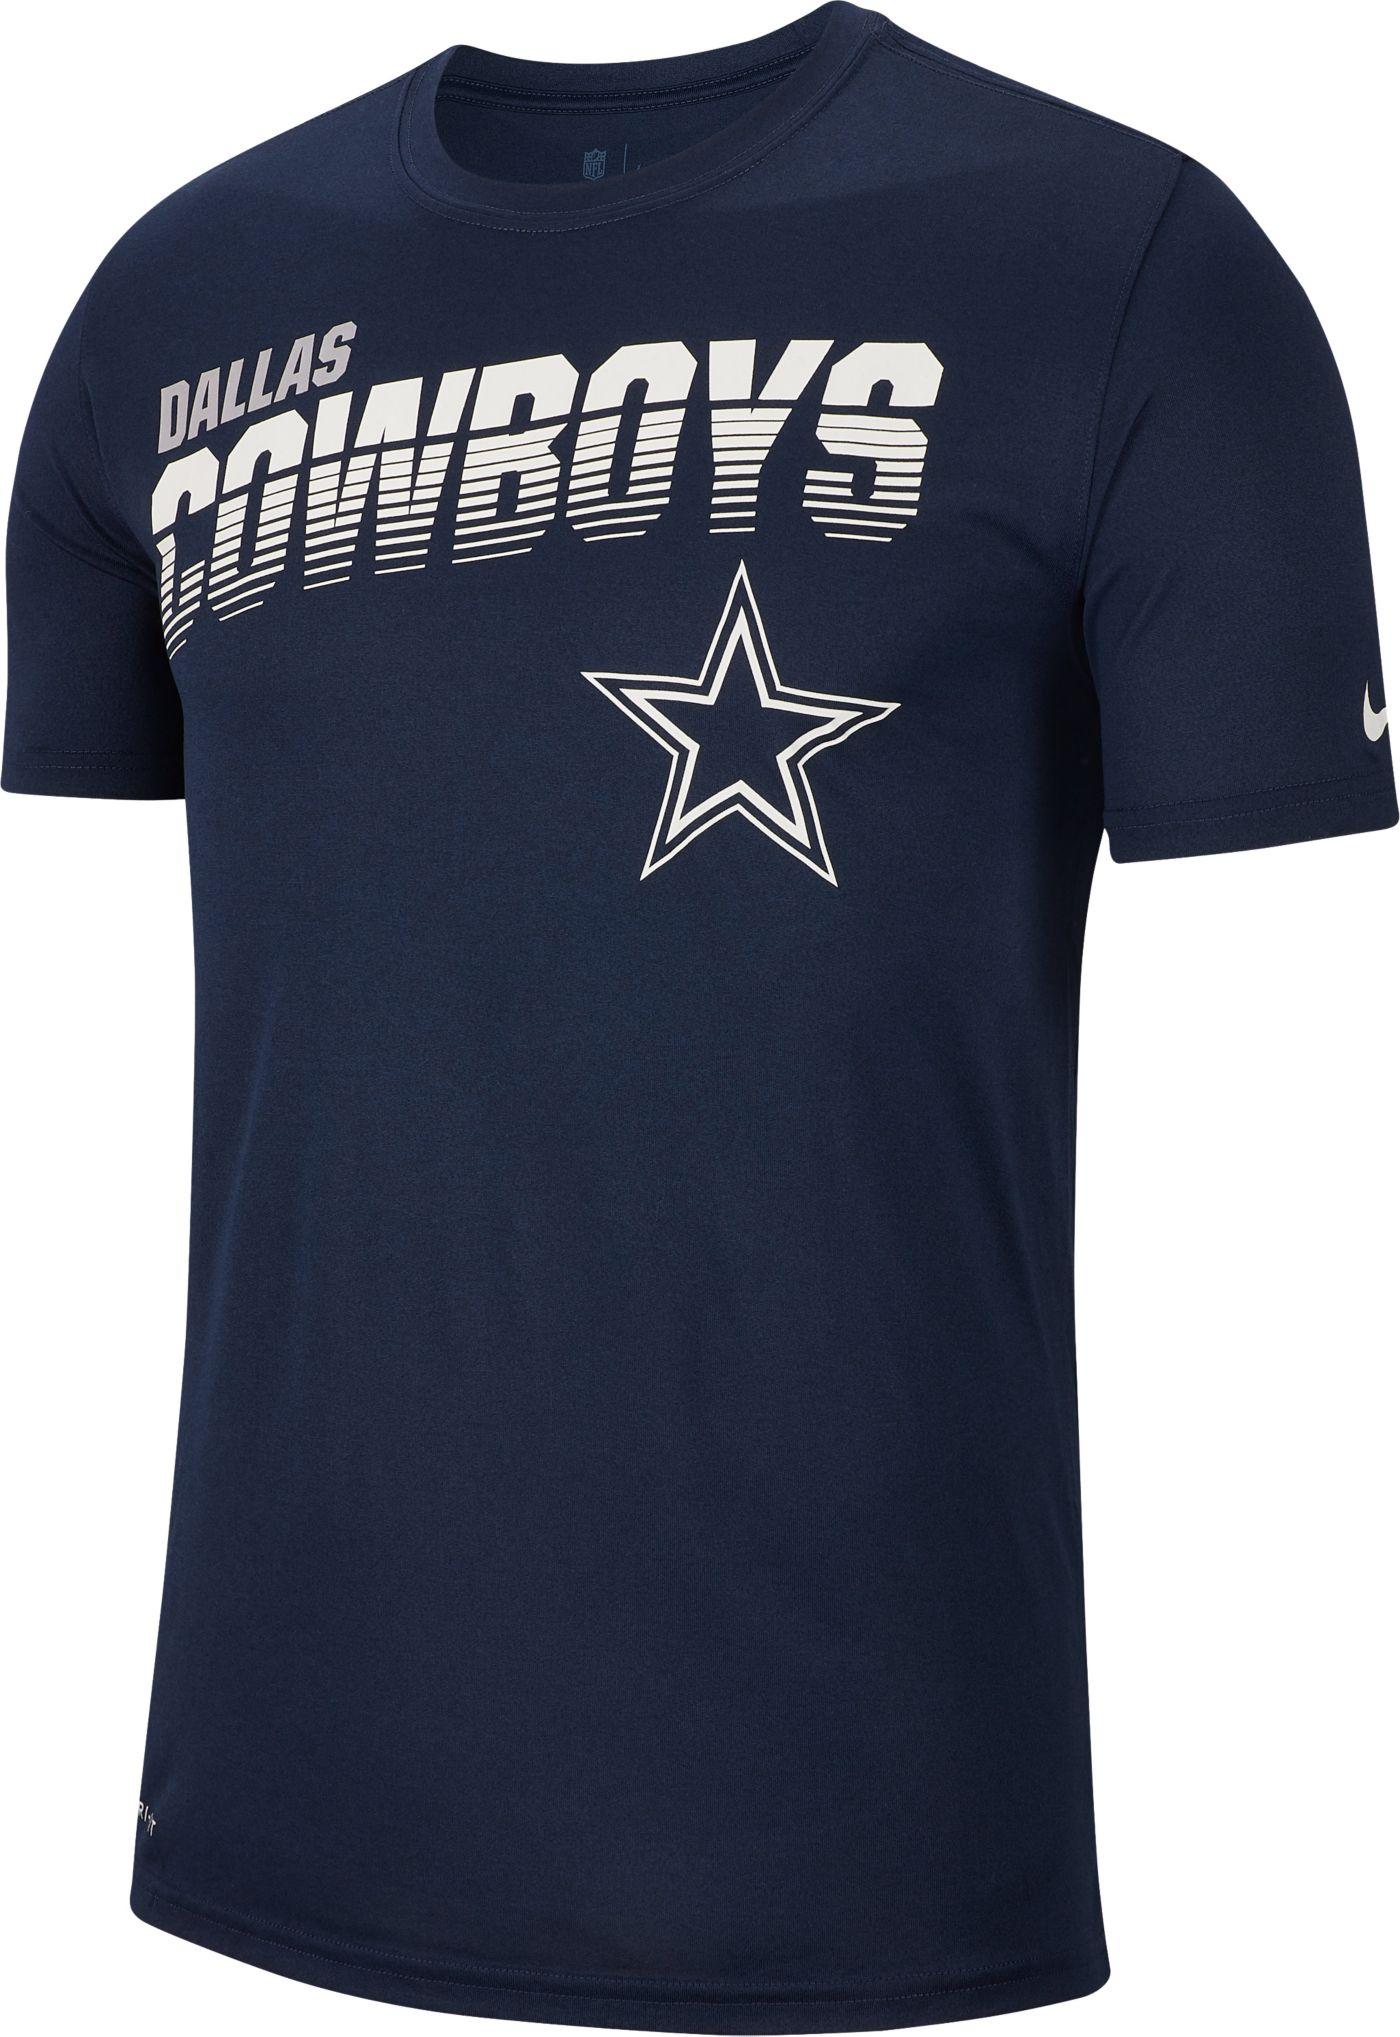 Nike Men's Dallas Cowboys Sideline Legend Performance Navy T-Shirt